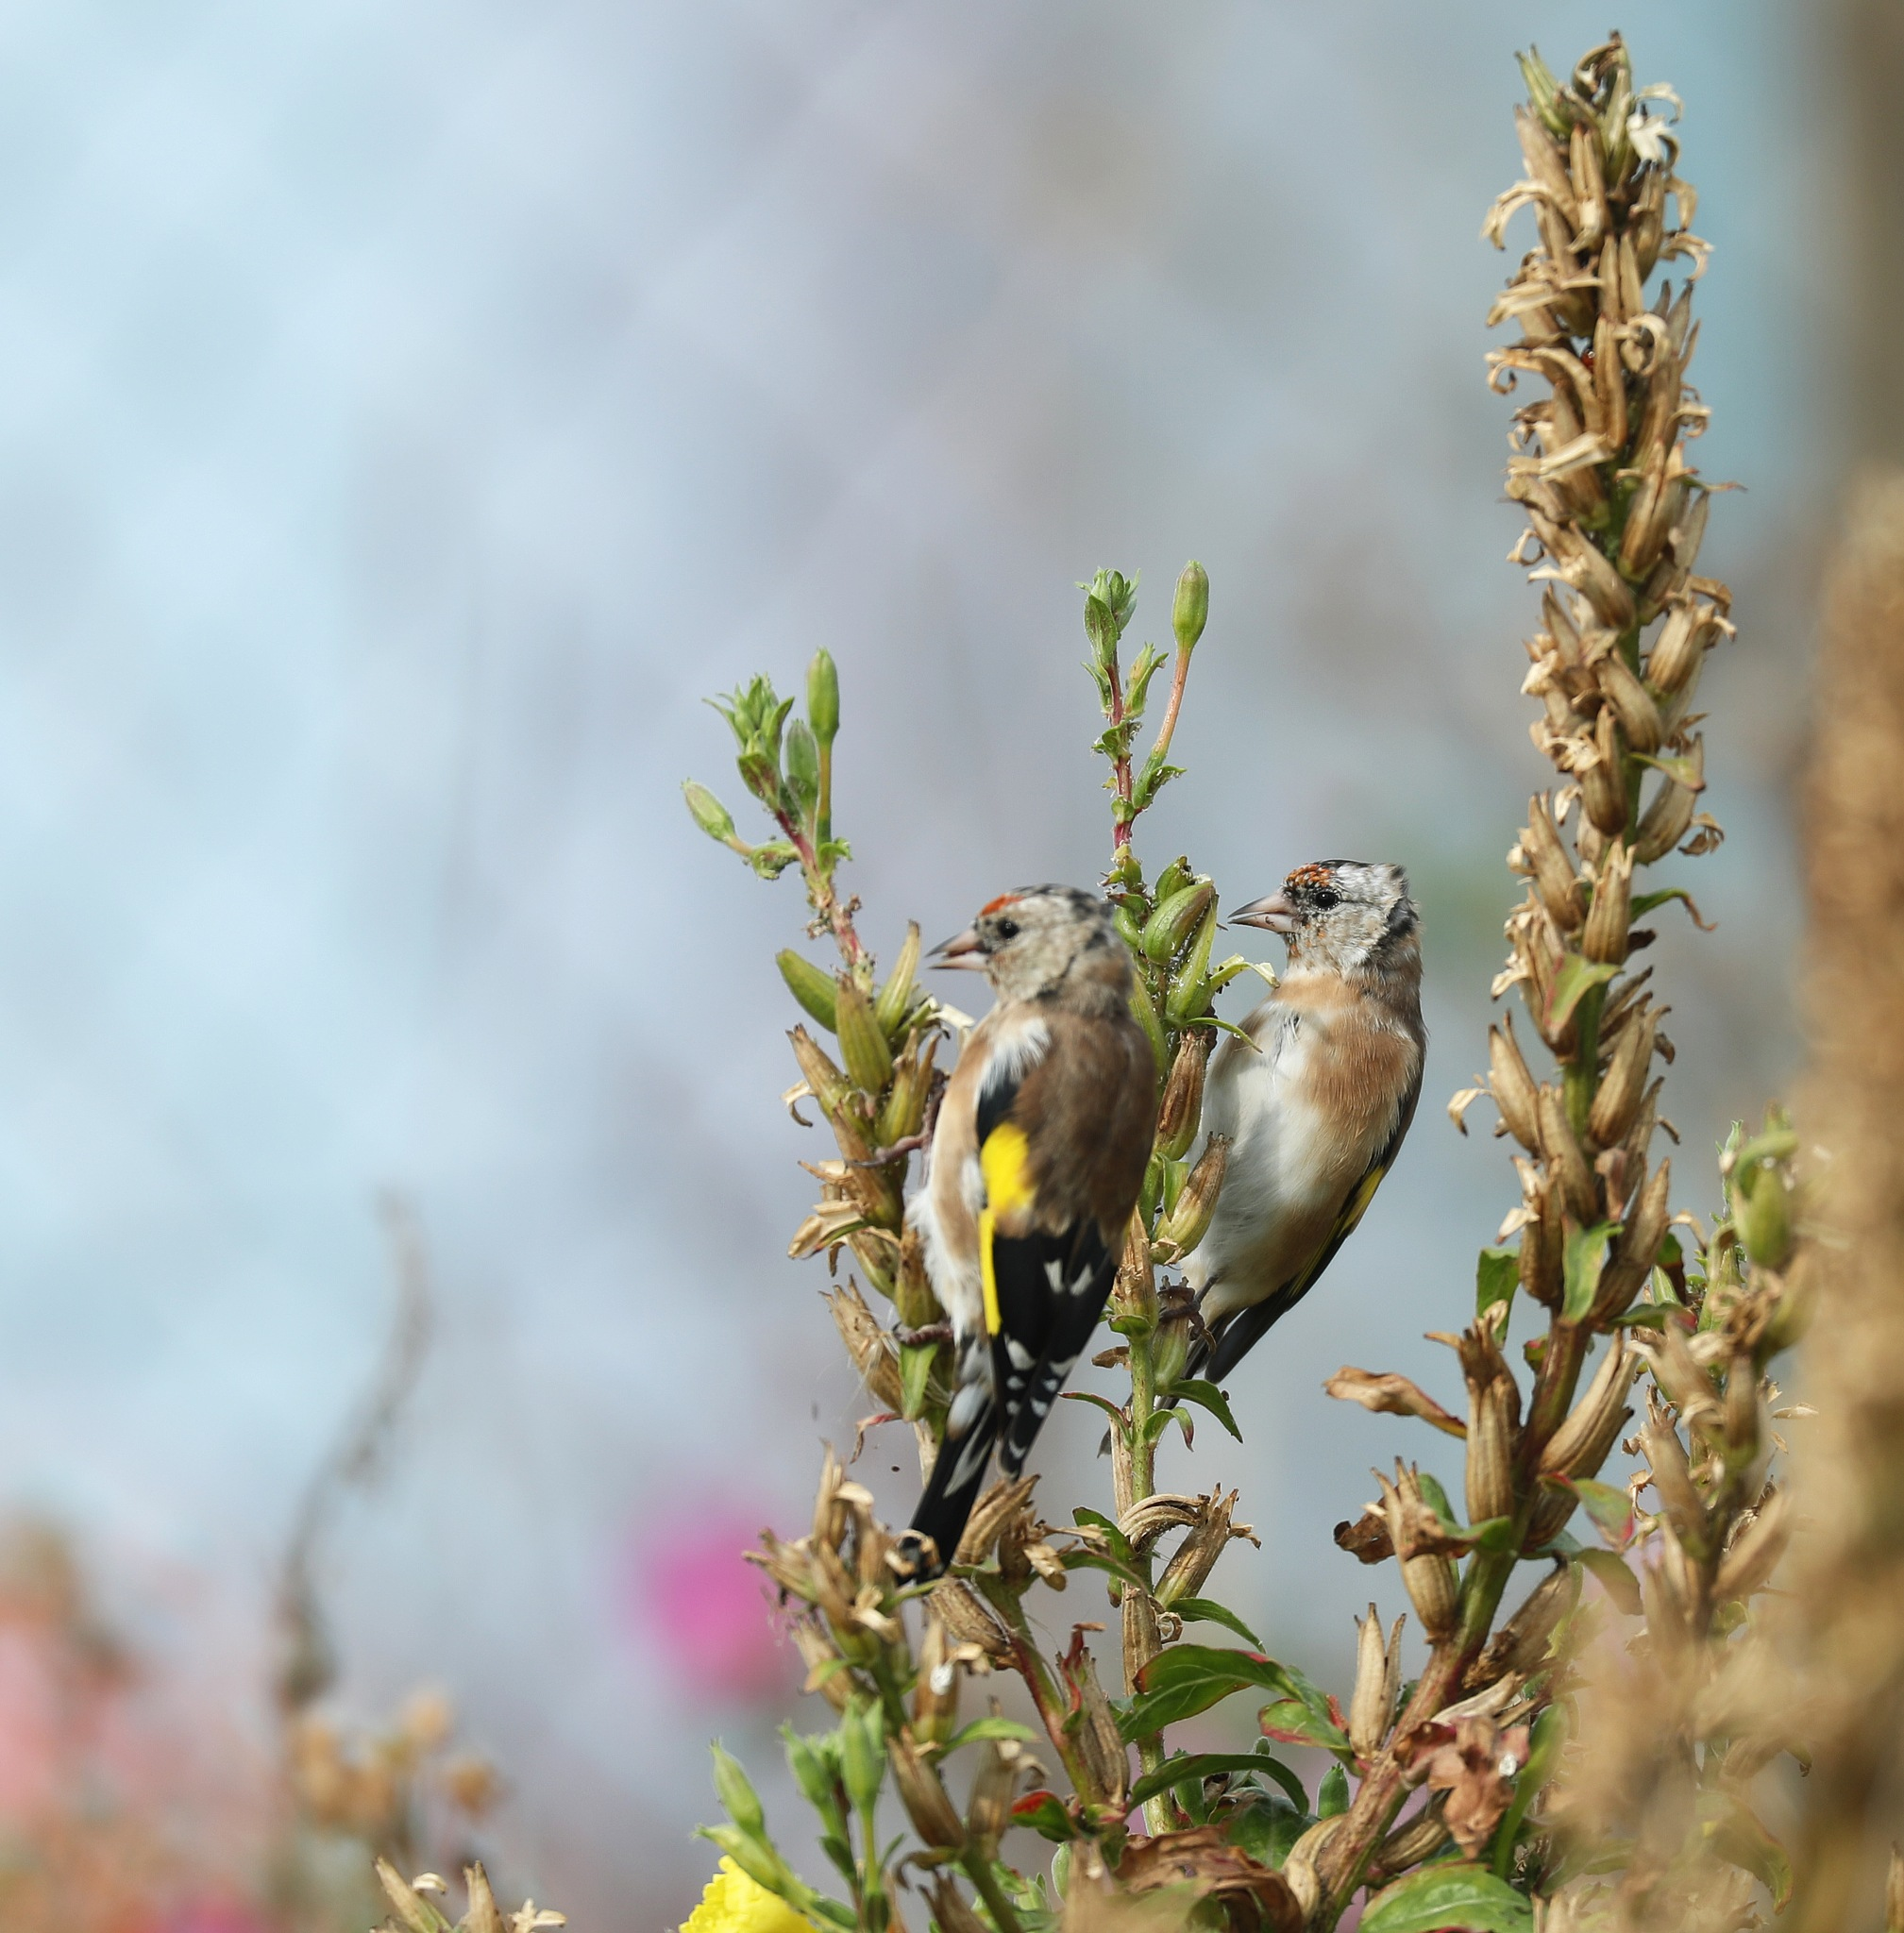 Putters European goldfinch by firstsnakeman